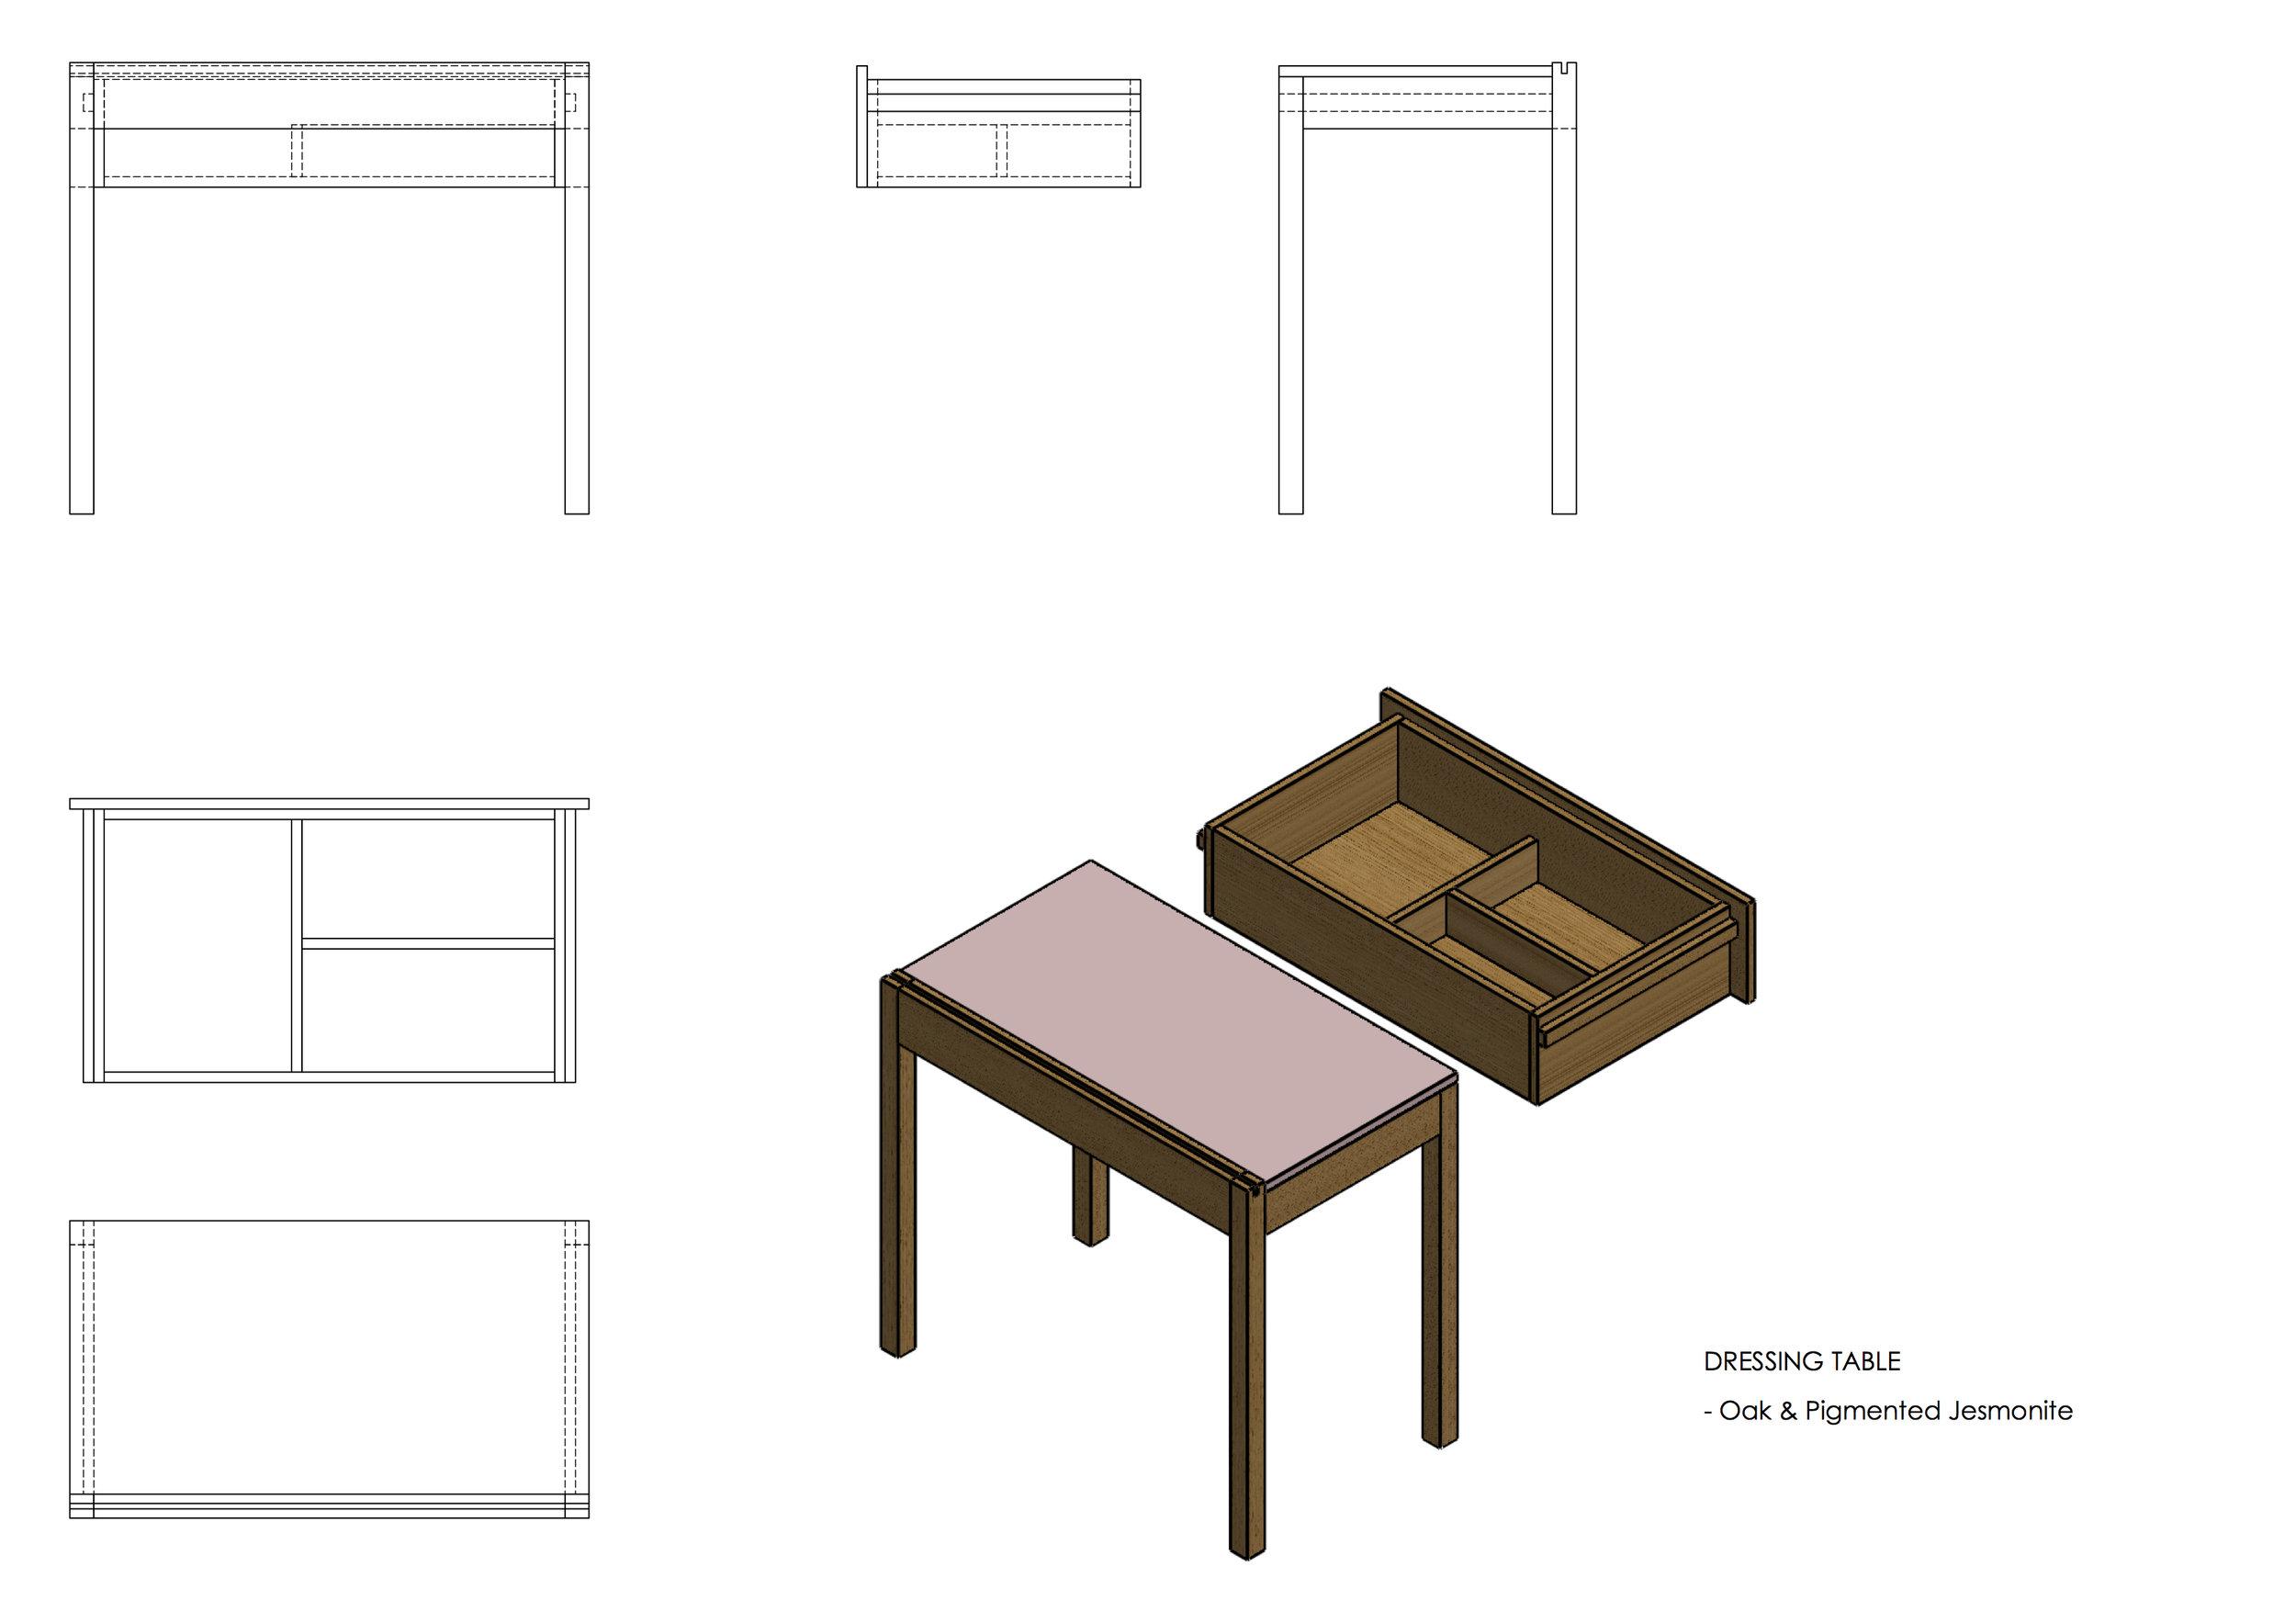 drawing DRESSING TABLE.jpg